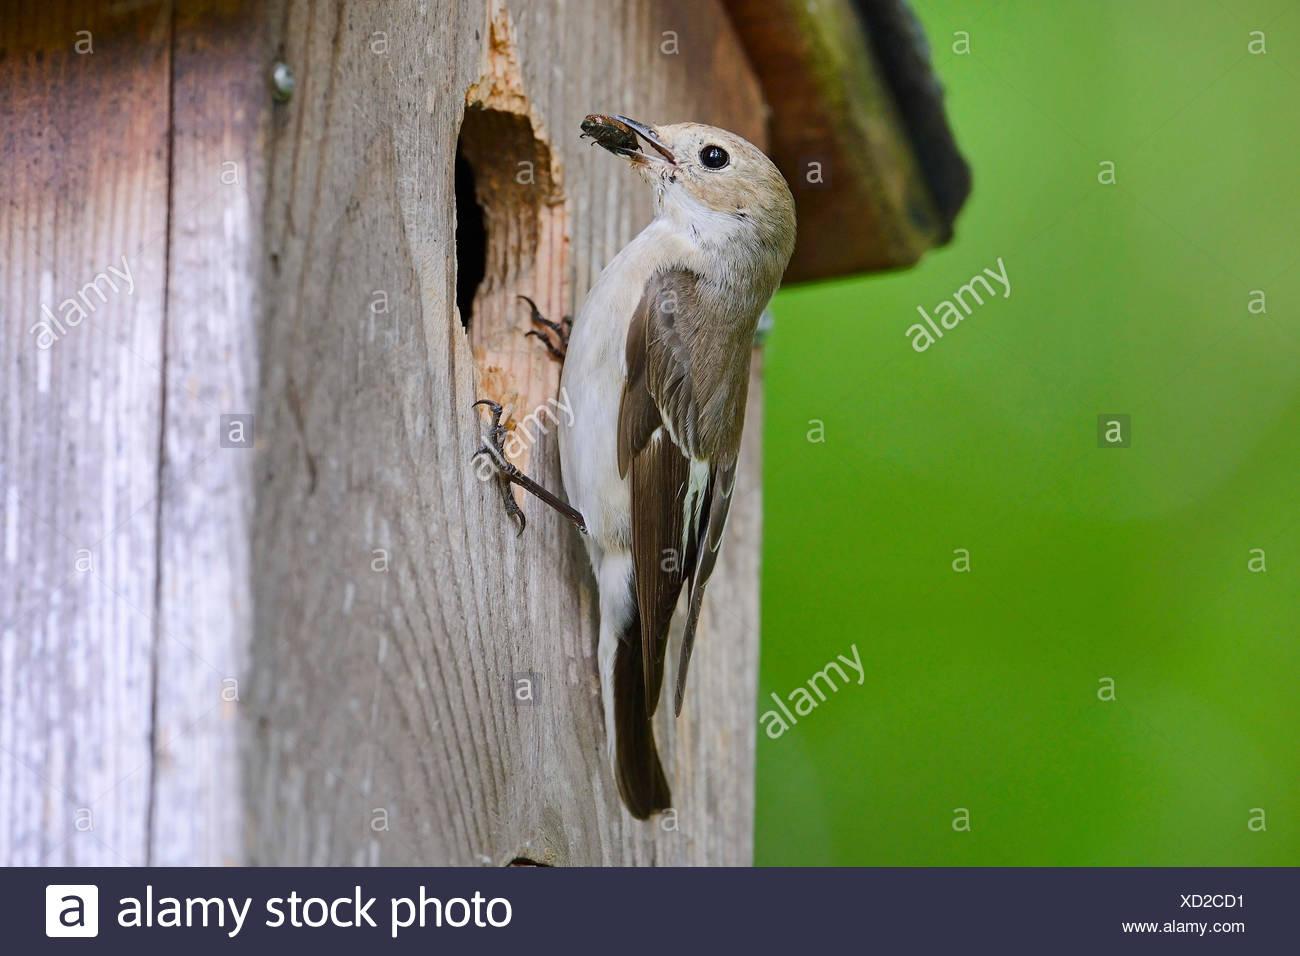 Trauerschnaepper, Trauer-Schnaepper, Trauerfliegenschnaepper, Trauer-Fliegenschnaepper (Ficedula hypoleuca), mit della Kaefer als Futt Immagini Stock